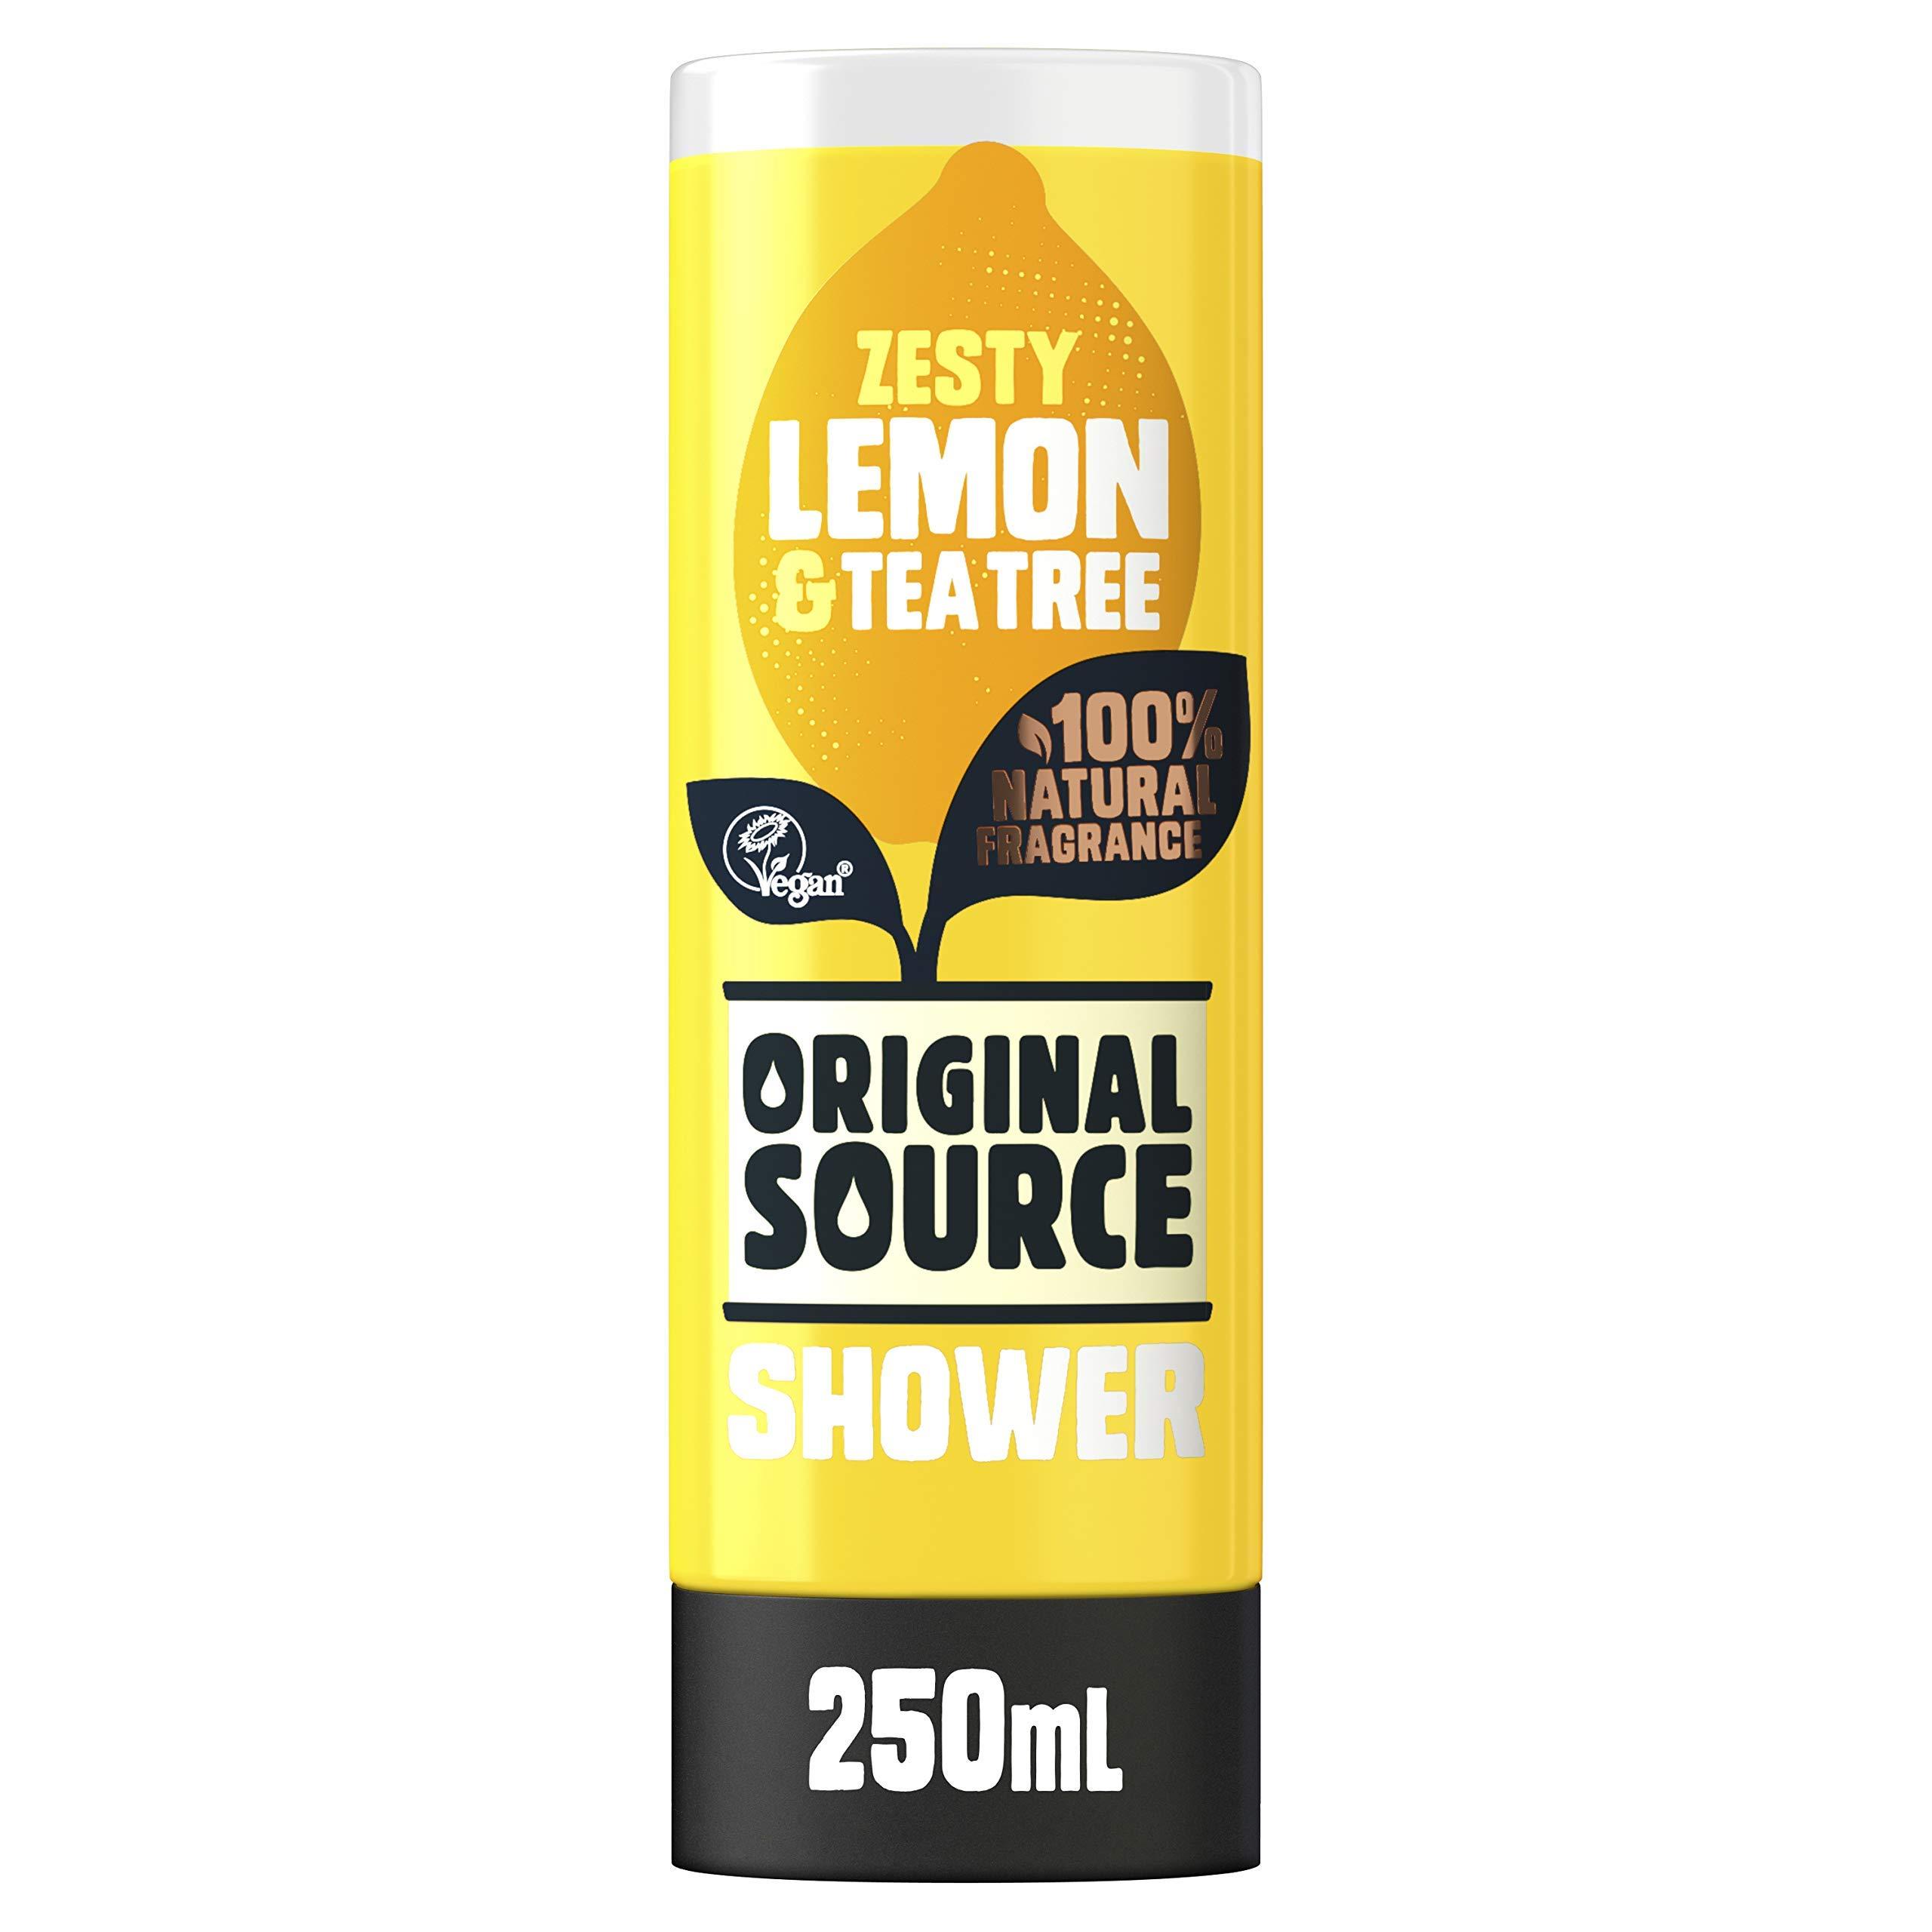 Original Source Lemon and Tea Tree Shower Gel, 250ml